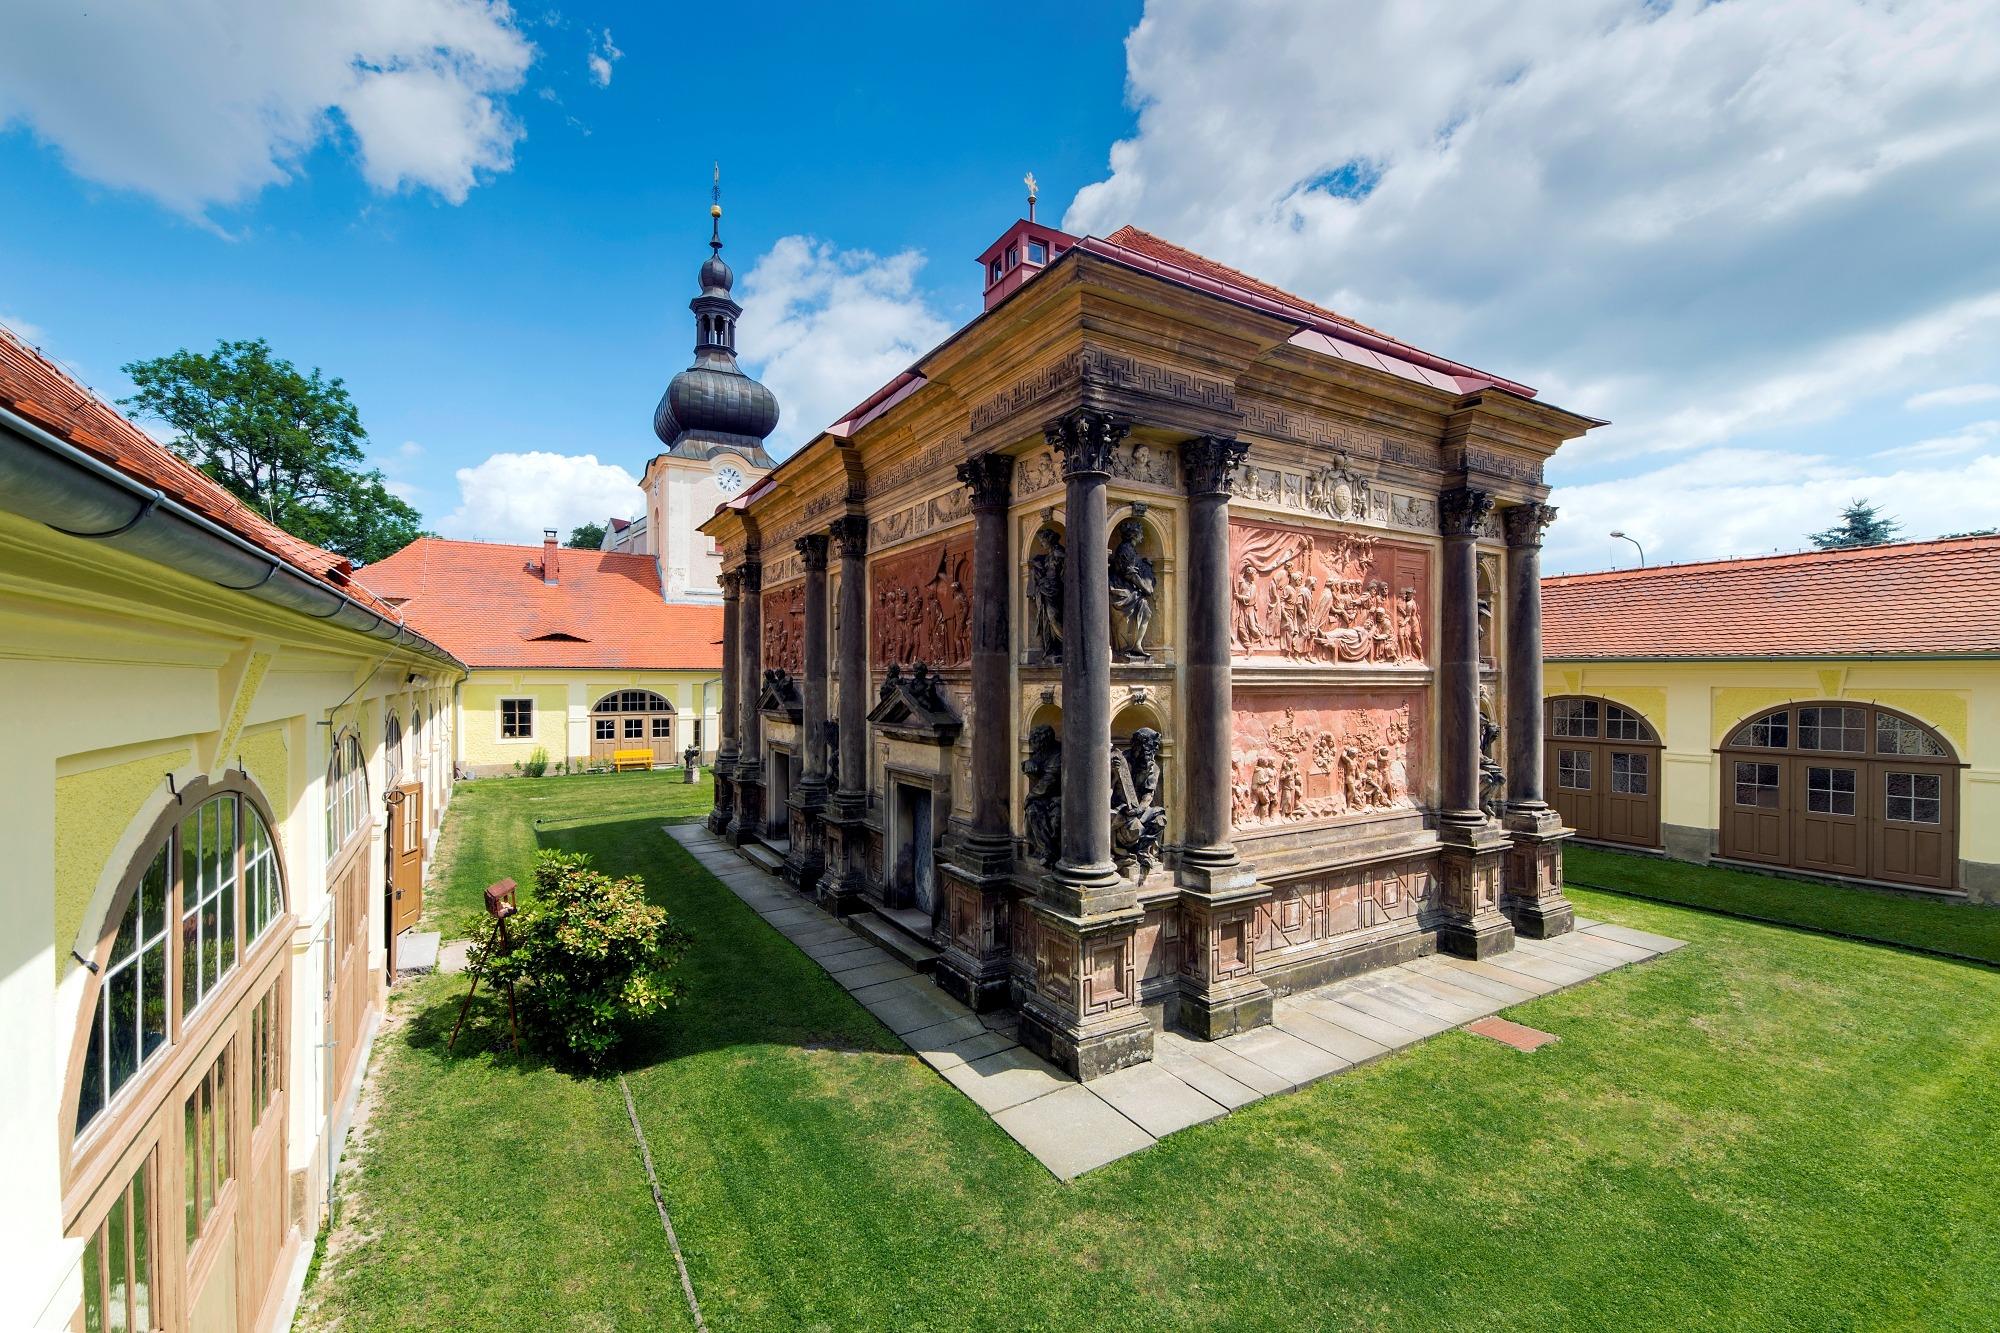 Loretánská-kaple_Loretokapelle-in-Rumburk5